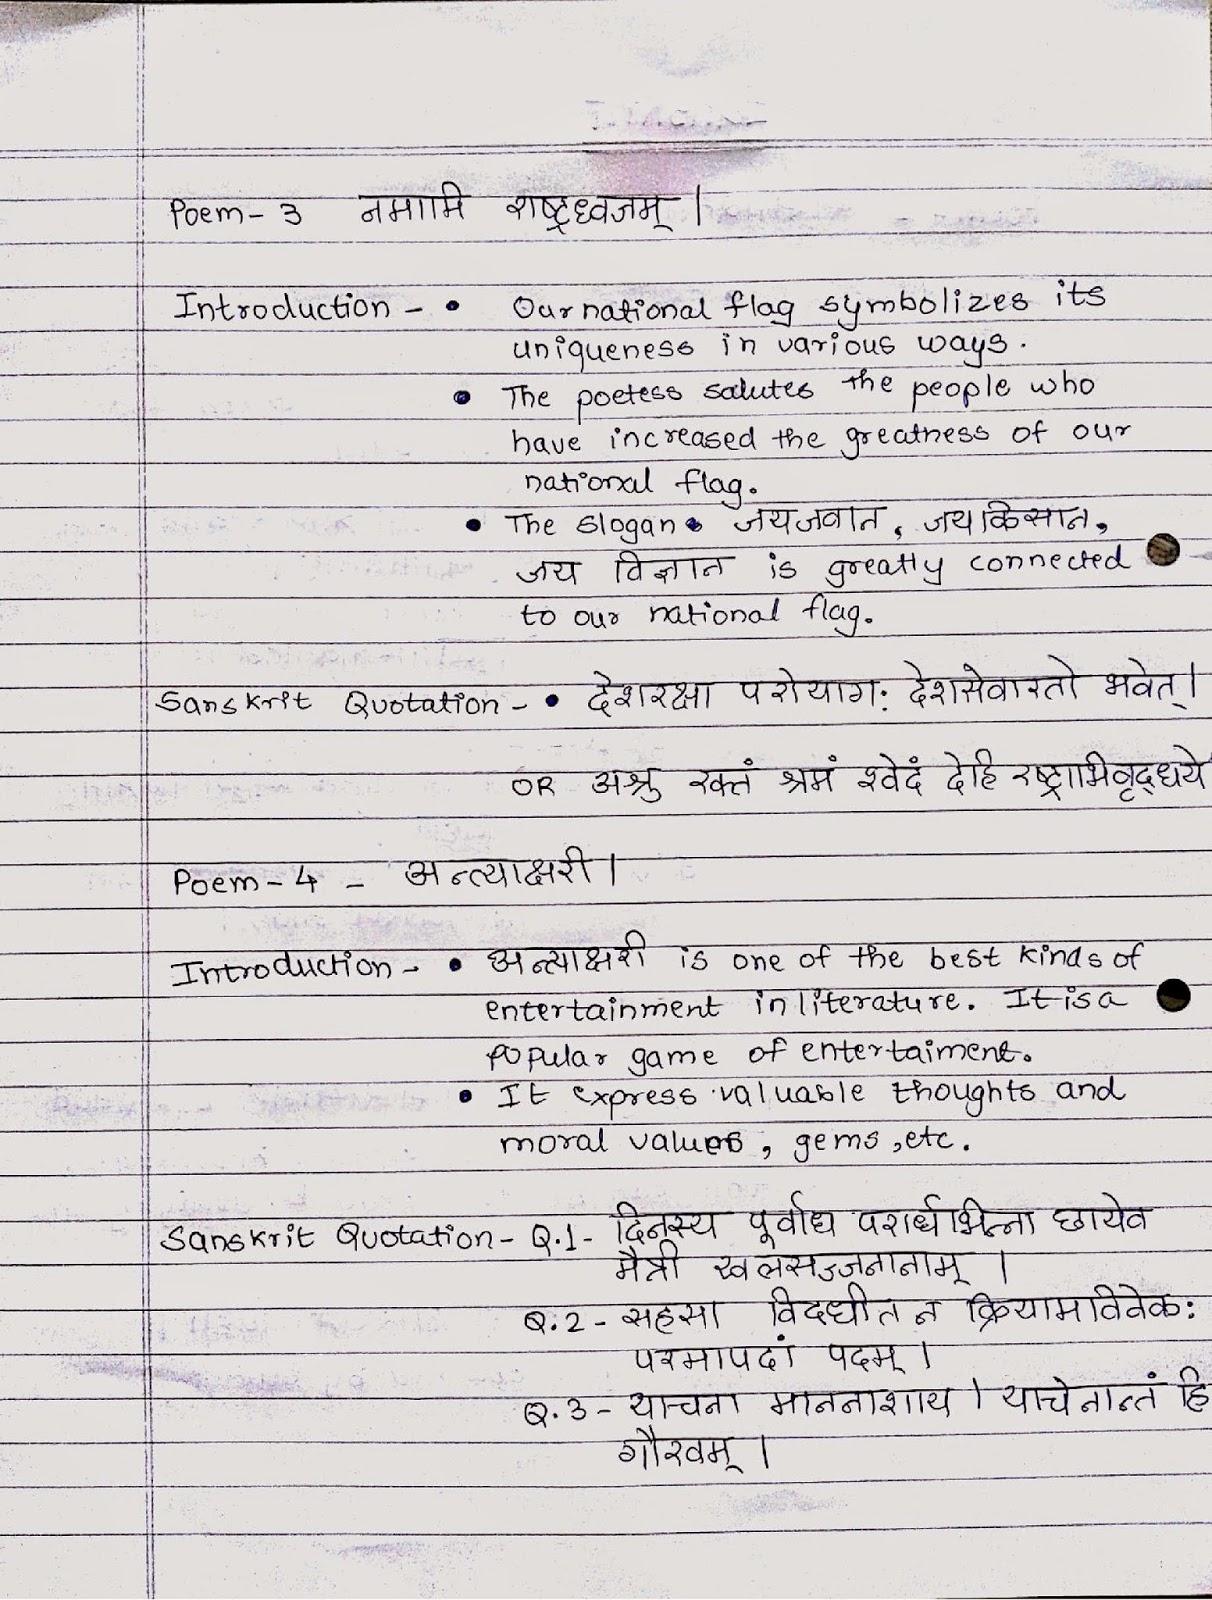 An essay on my school in sanskrit